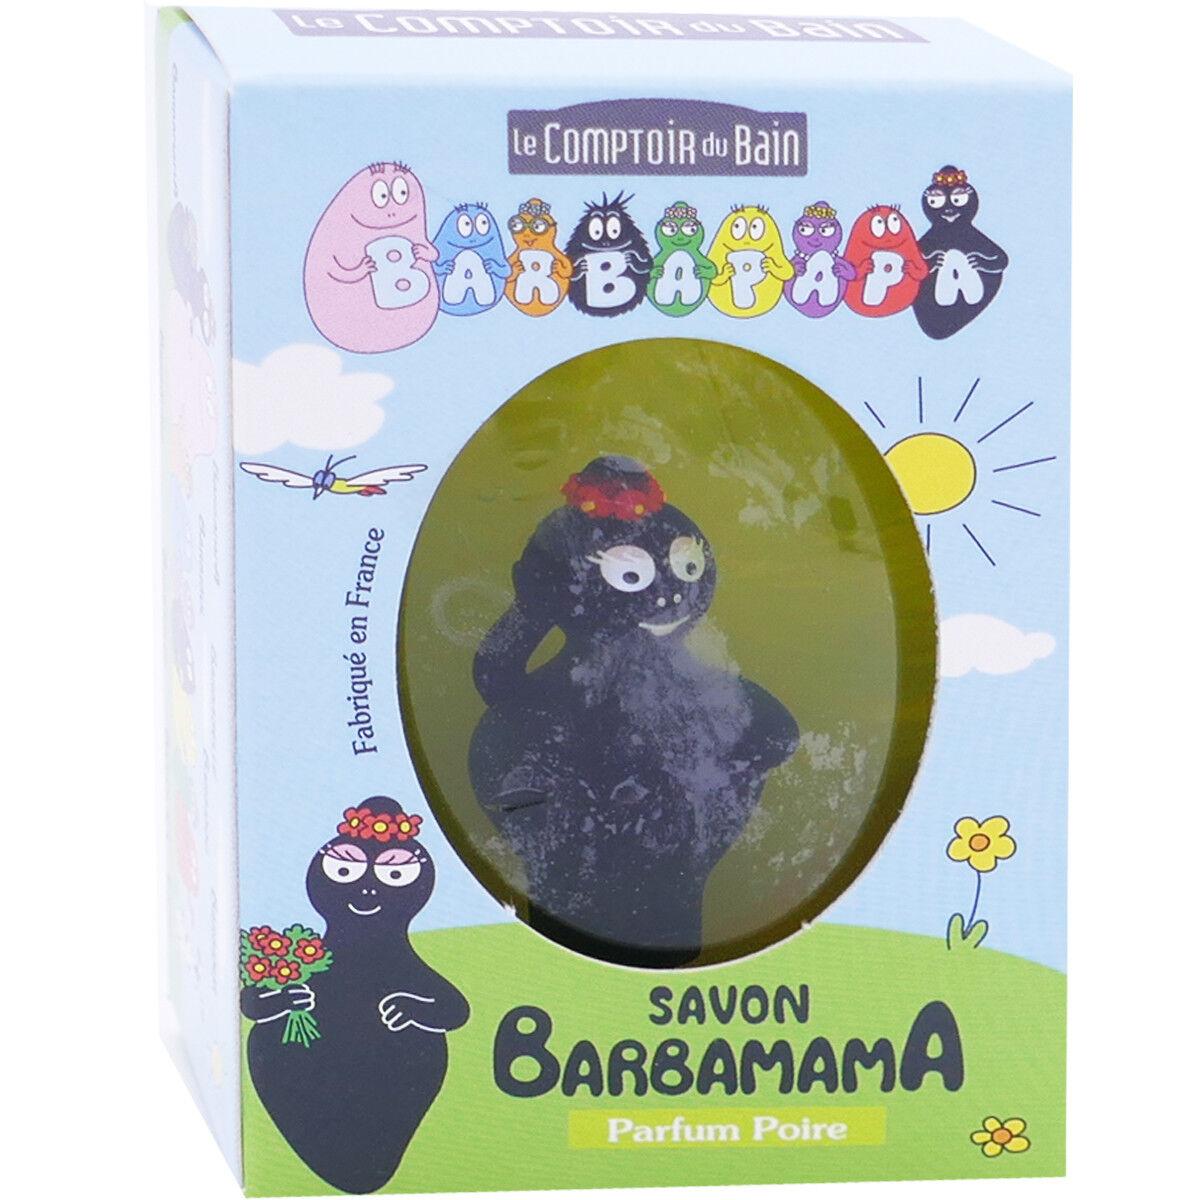 LE COMPTOIR DU BAIN Barbapapa savon barbamama parfum poire 84g + figurine